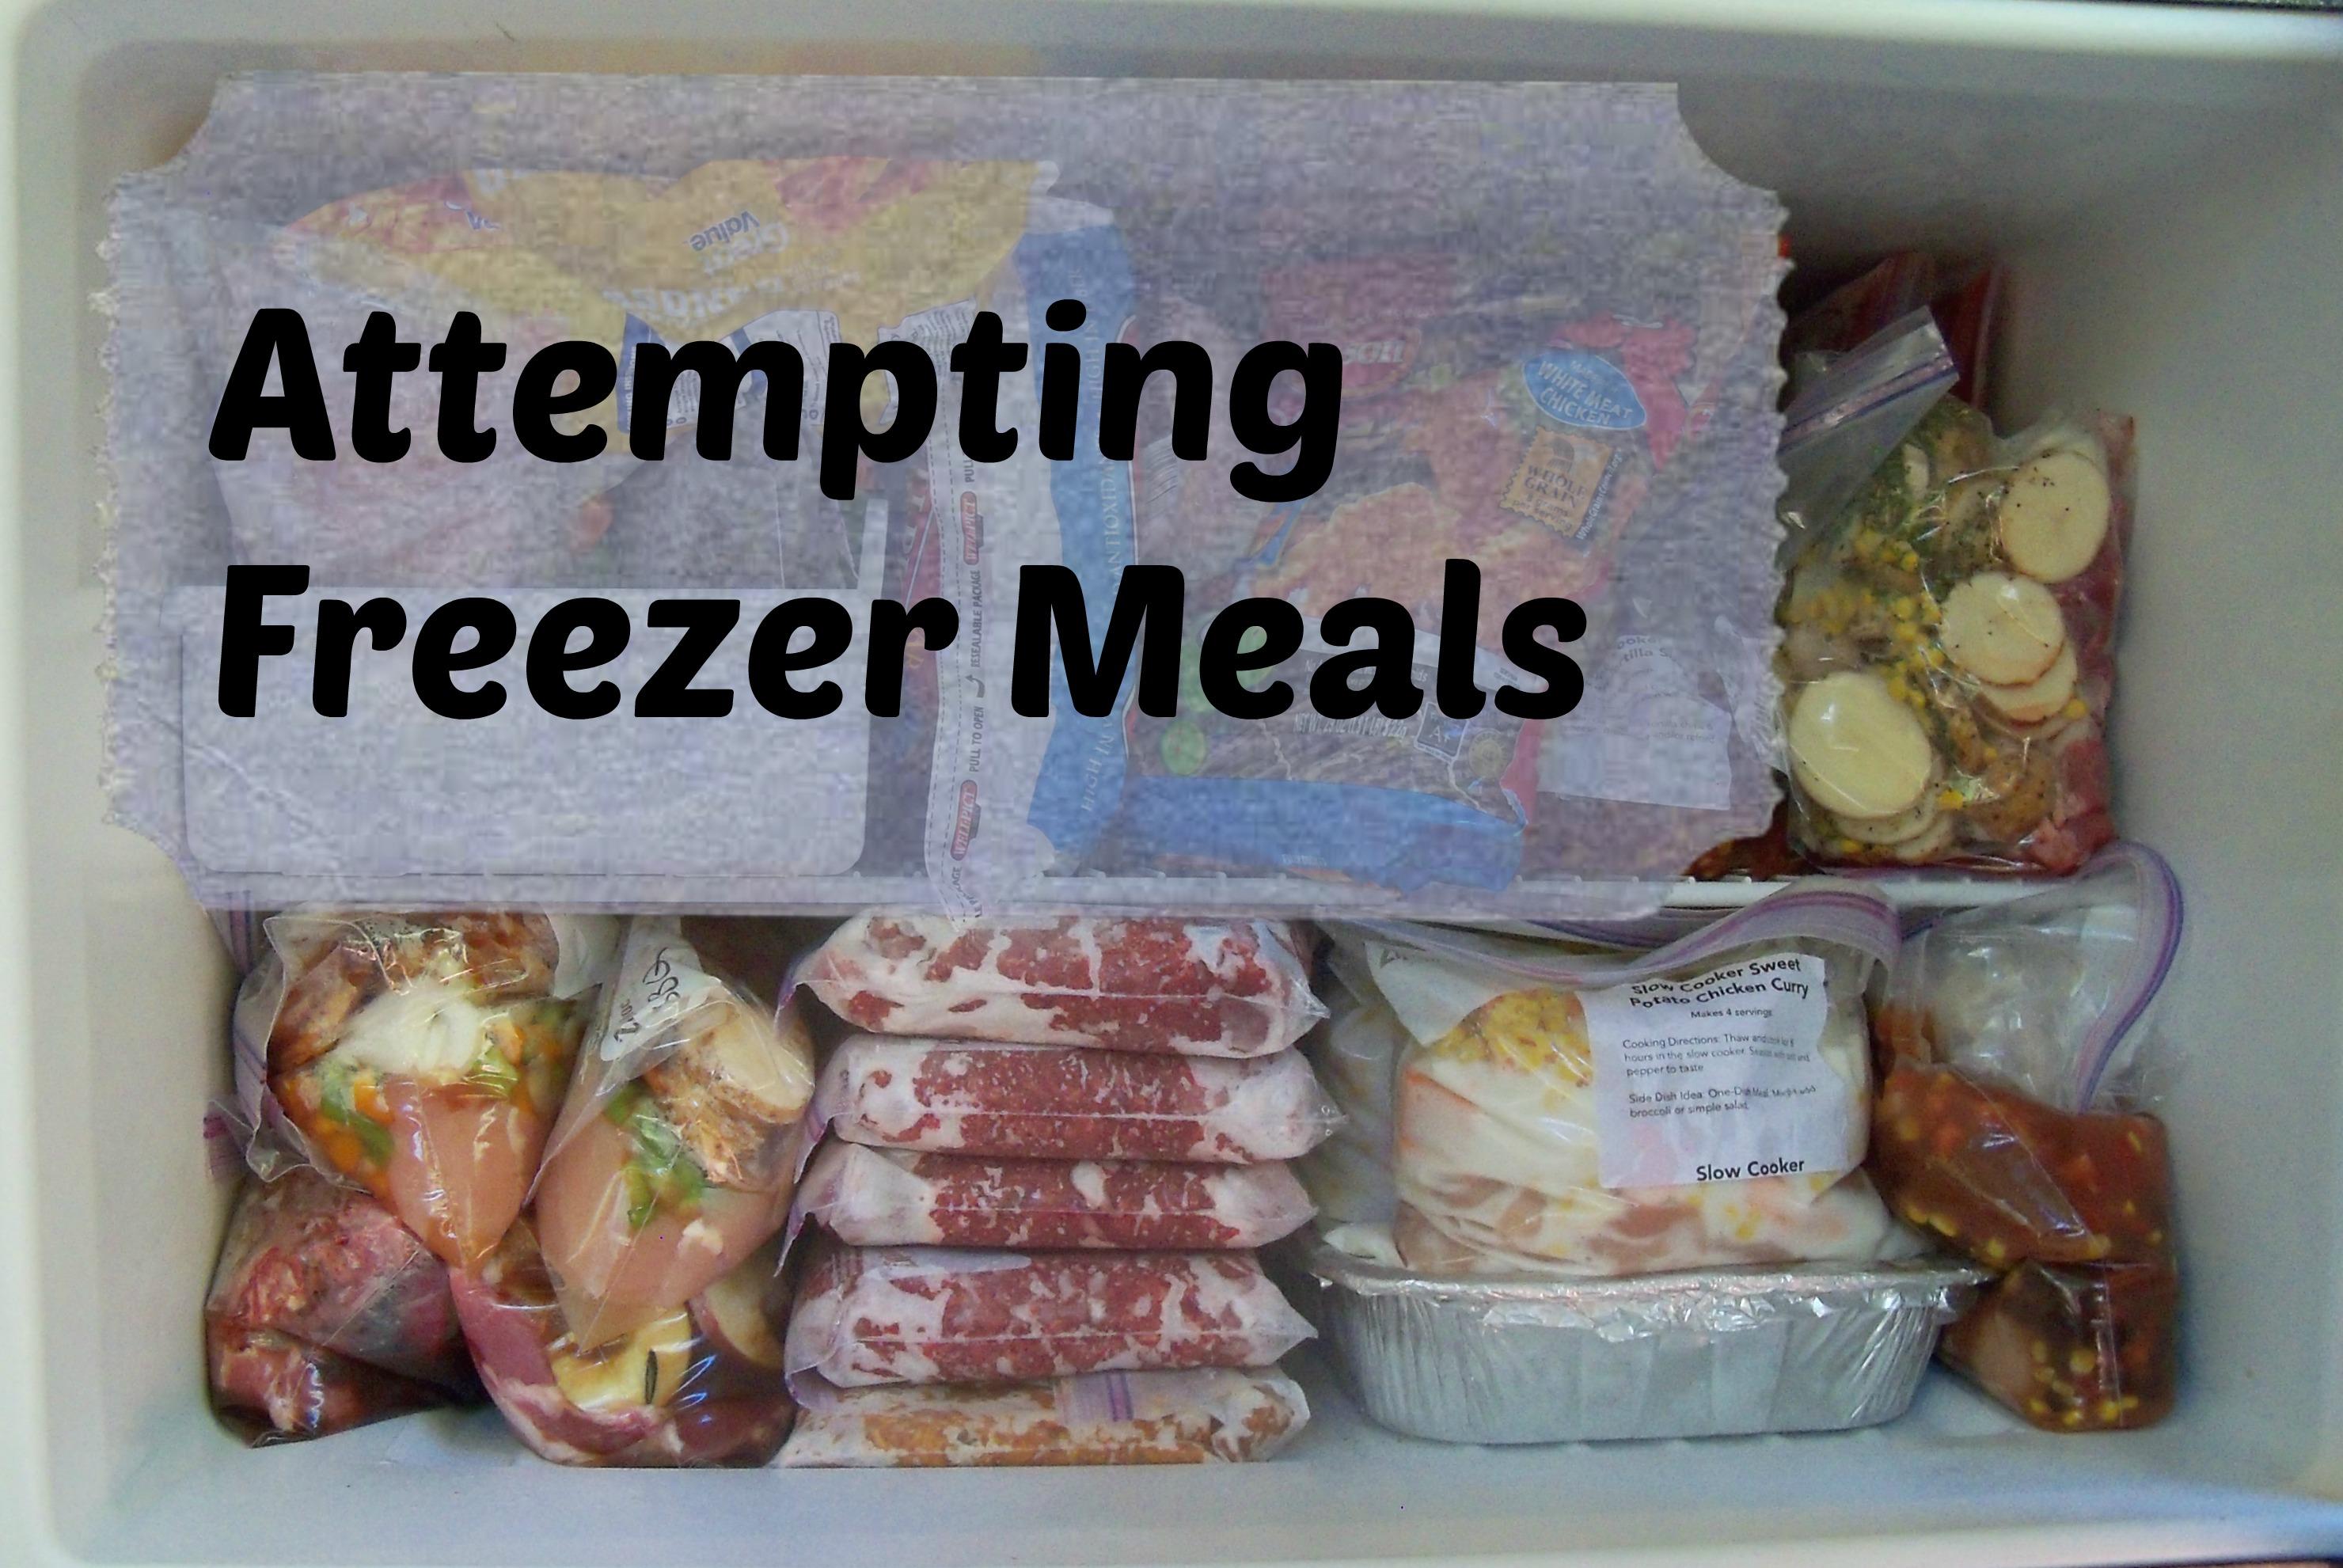 Attempting Freezer Meals